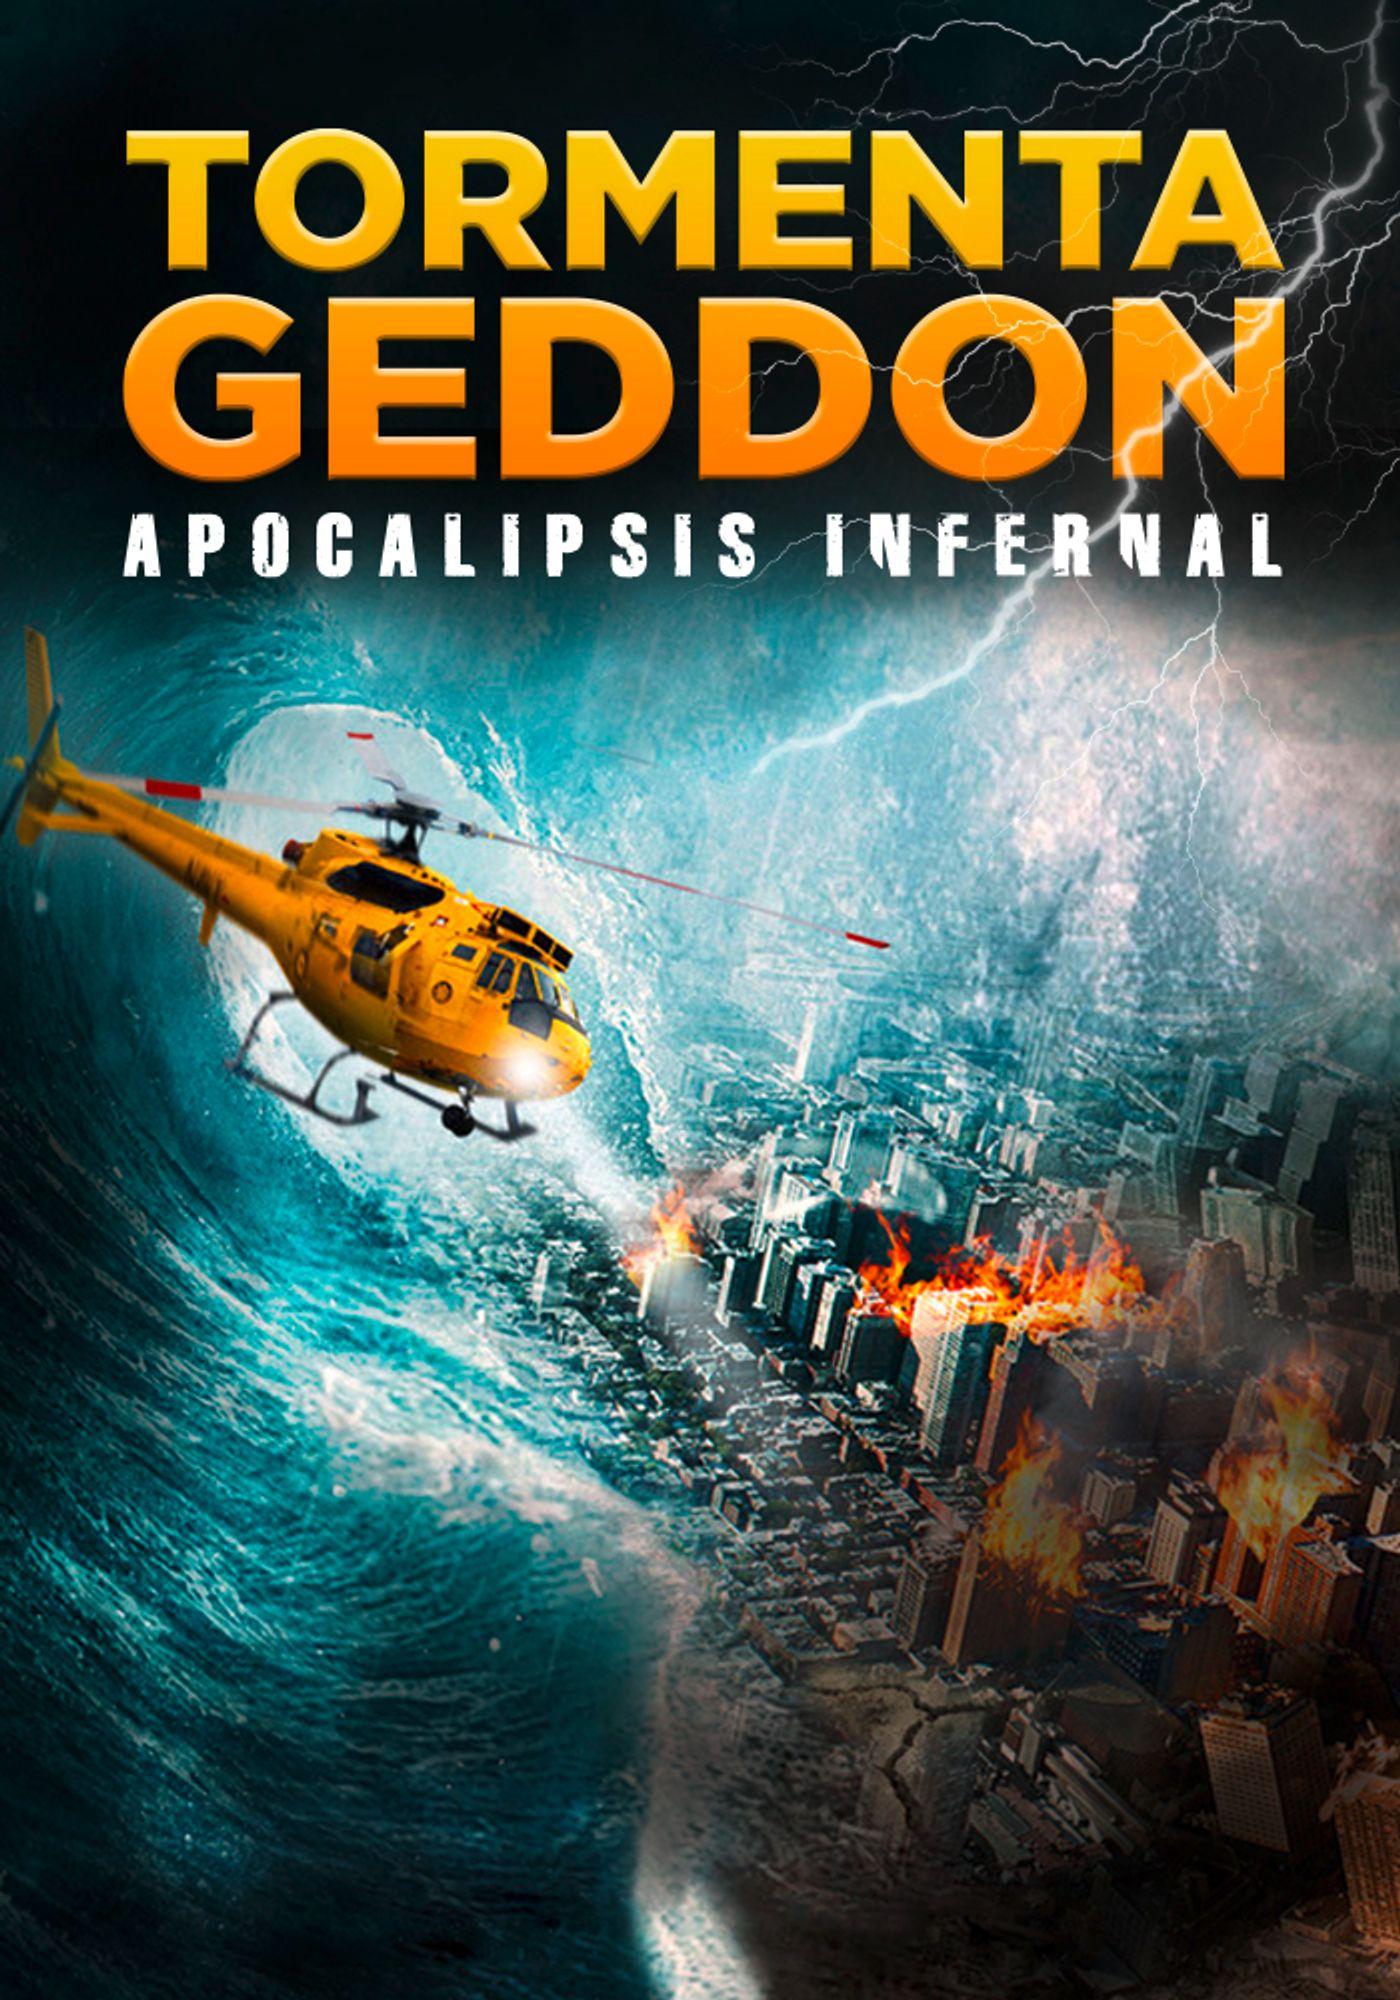 Tormentageddon: apocalipsis infernal